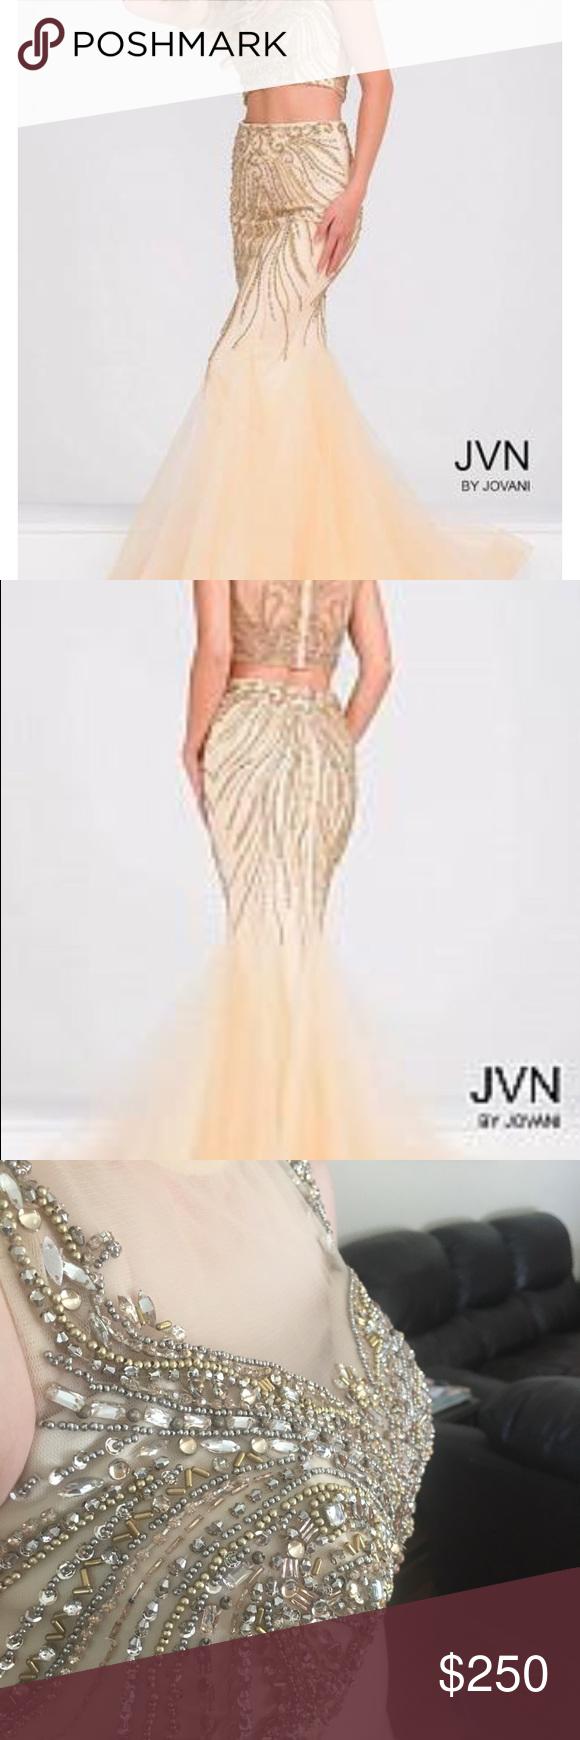 Jvn by jovani nudegold prom dress sadly re poshing daughter didnut